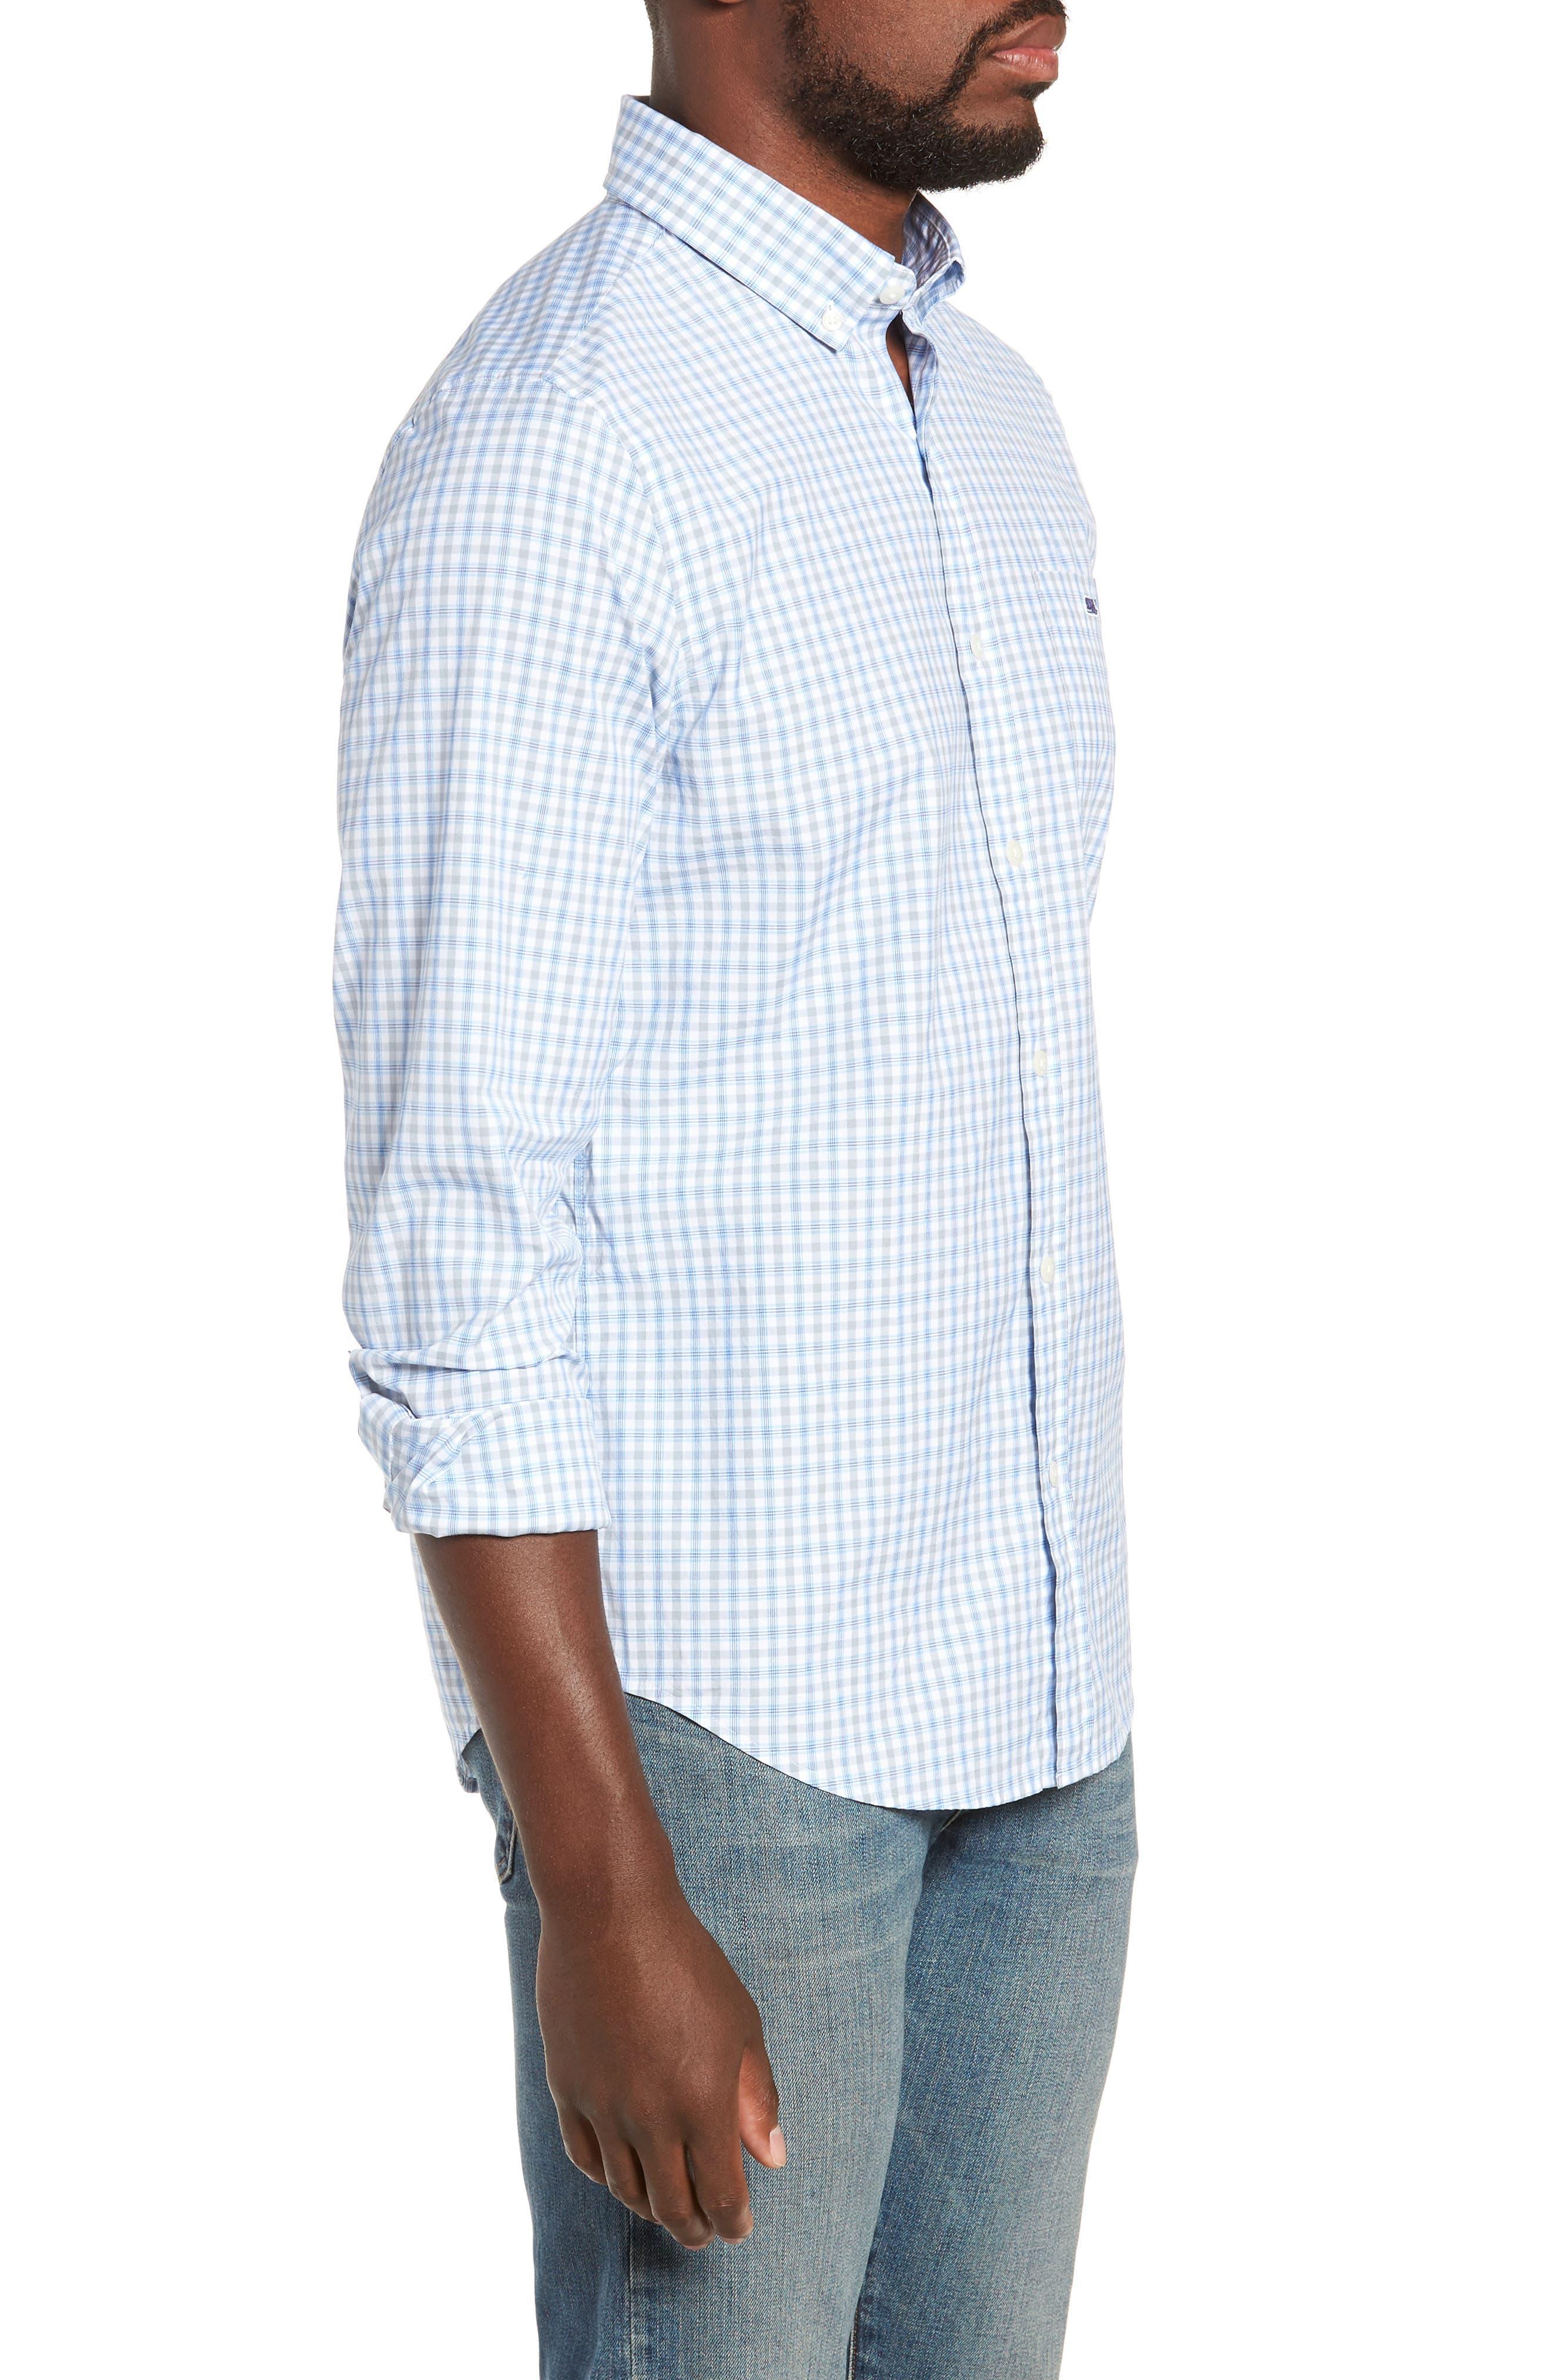 VINEYARD VINES,                             Murray Slim Fit Sport Shirt,                             Alternate thumbnail 4, color,                             034